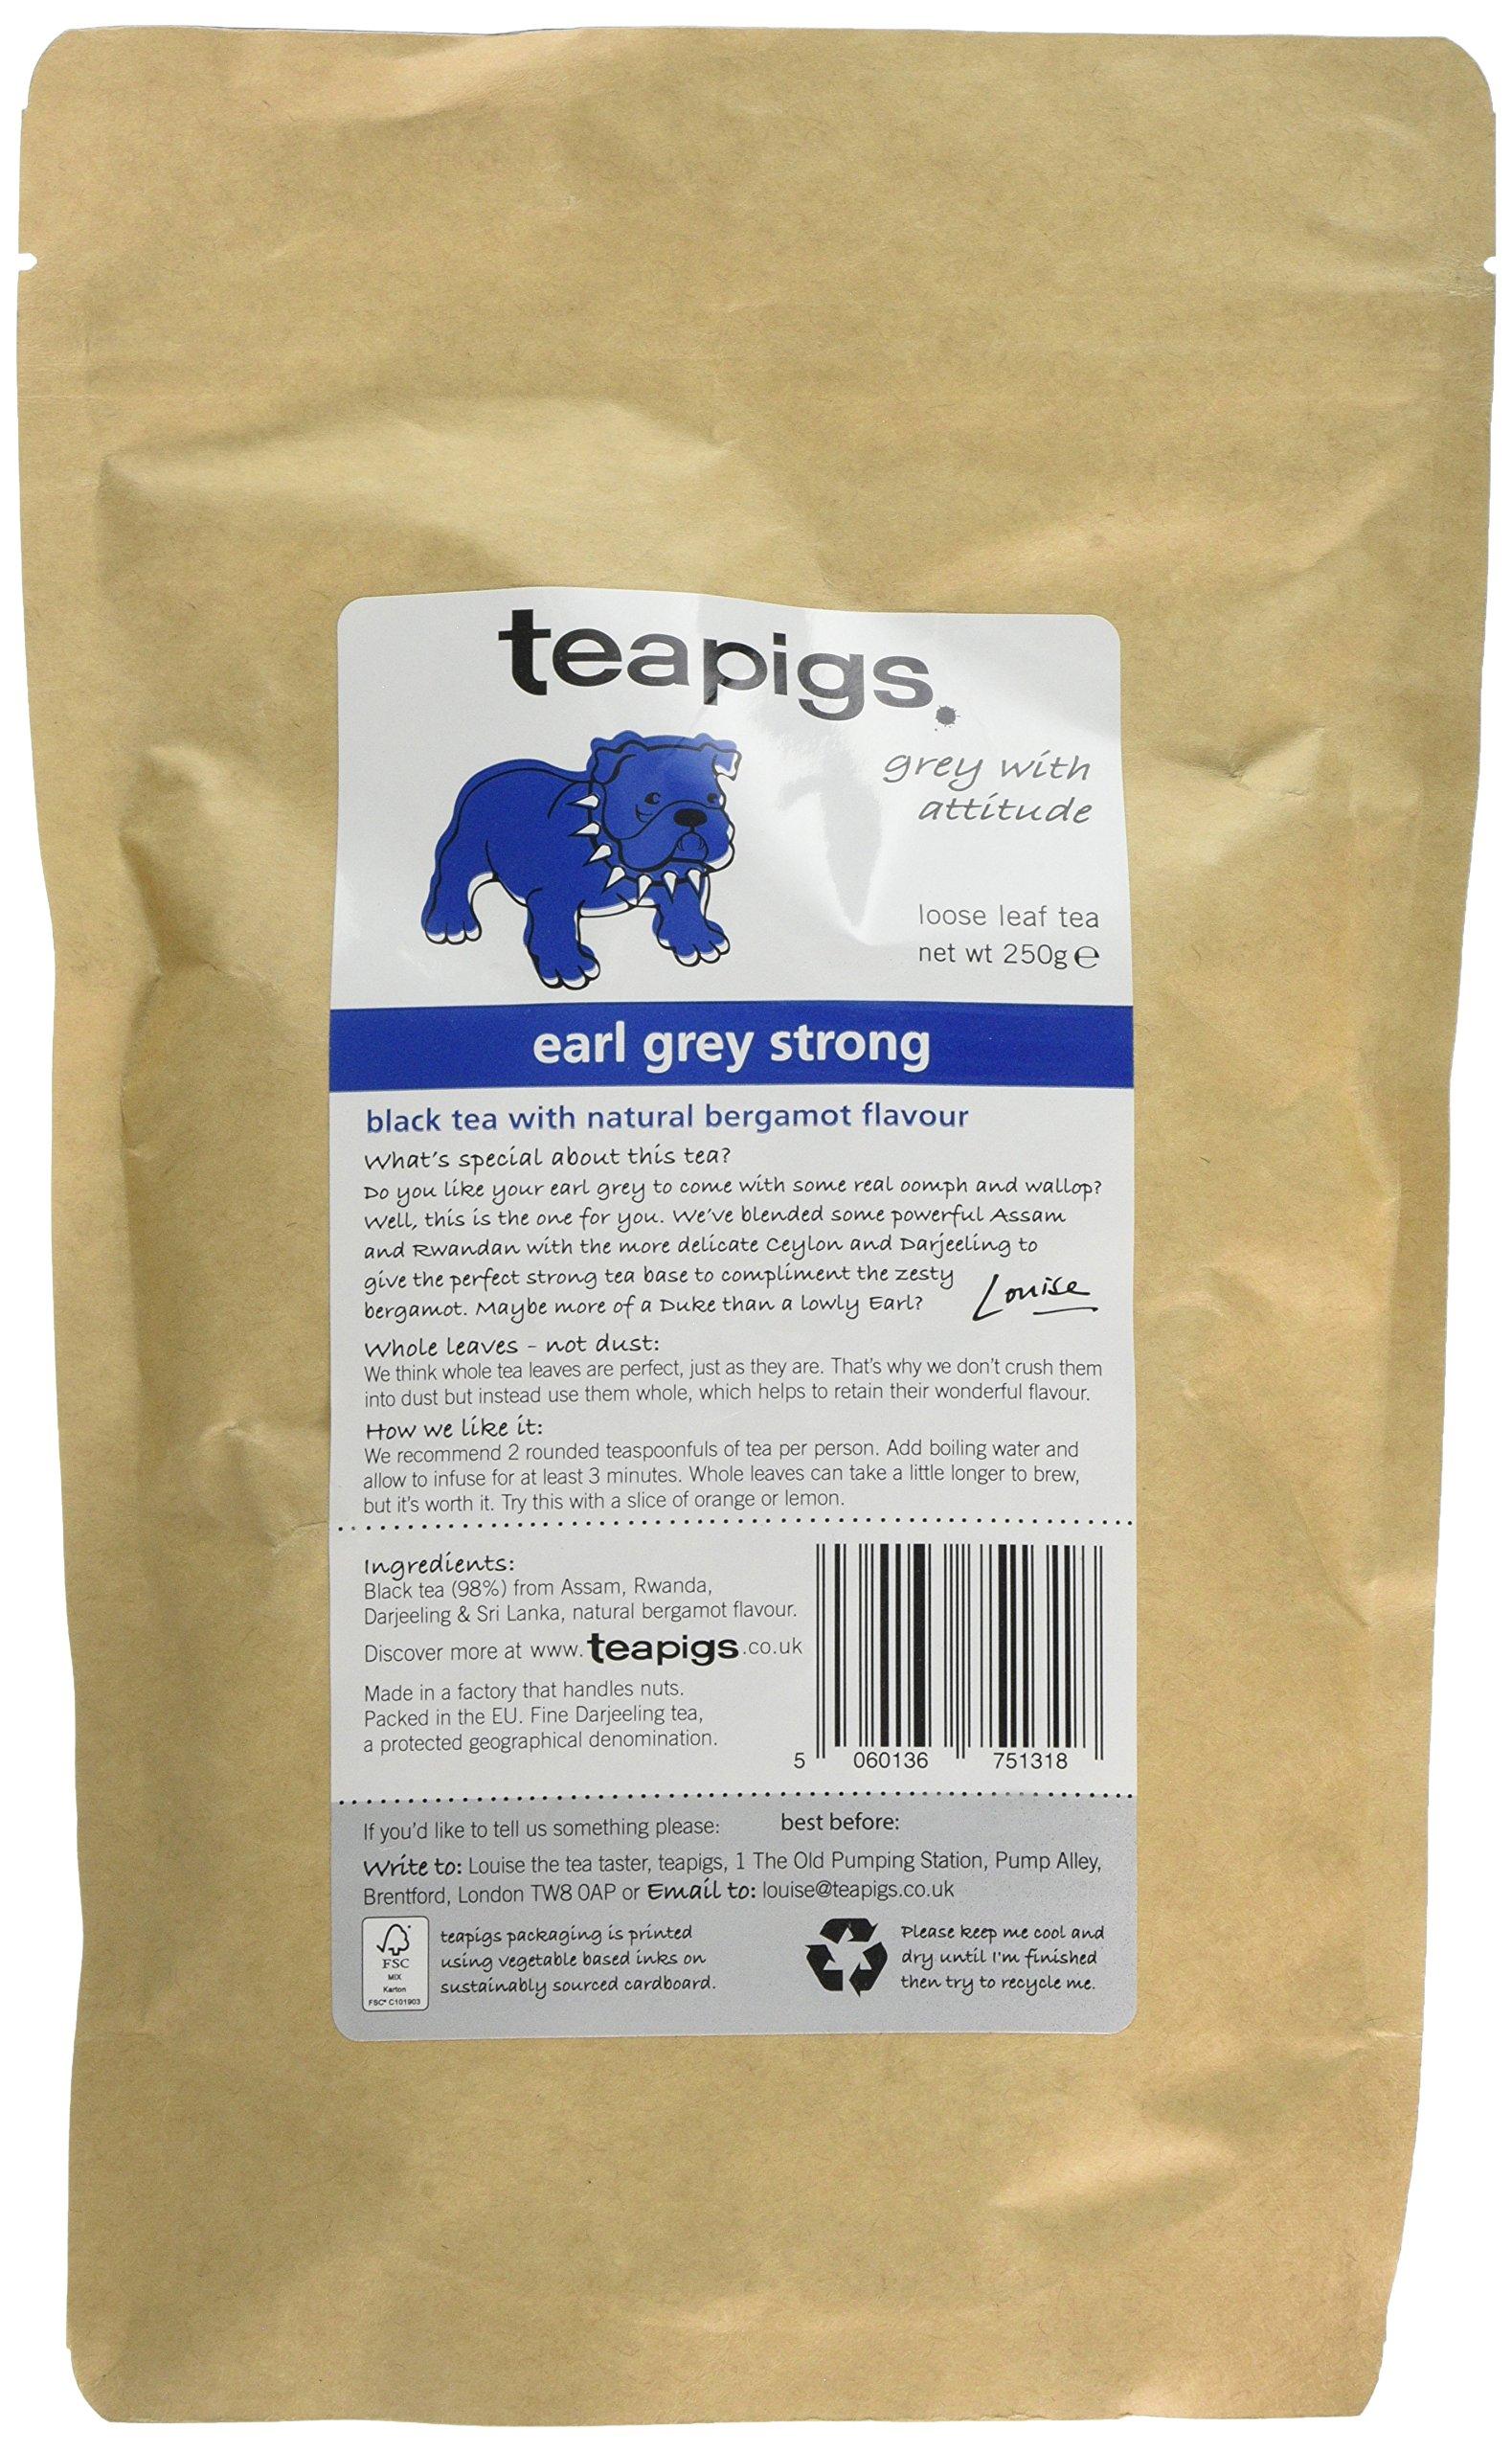 Teapigs earl grey strong tea (black tea) (earl grey) (250g) (a fruity tea with aromas of bergamot) (brews in 3 minutes)